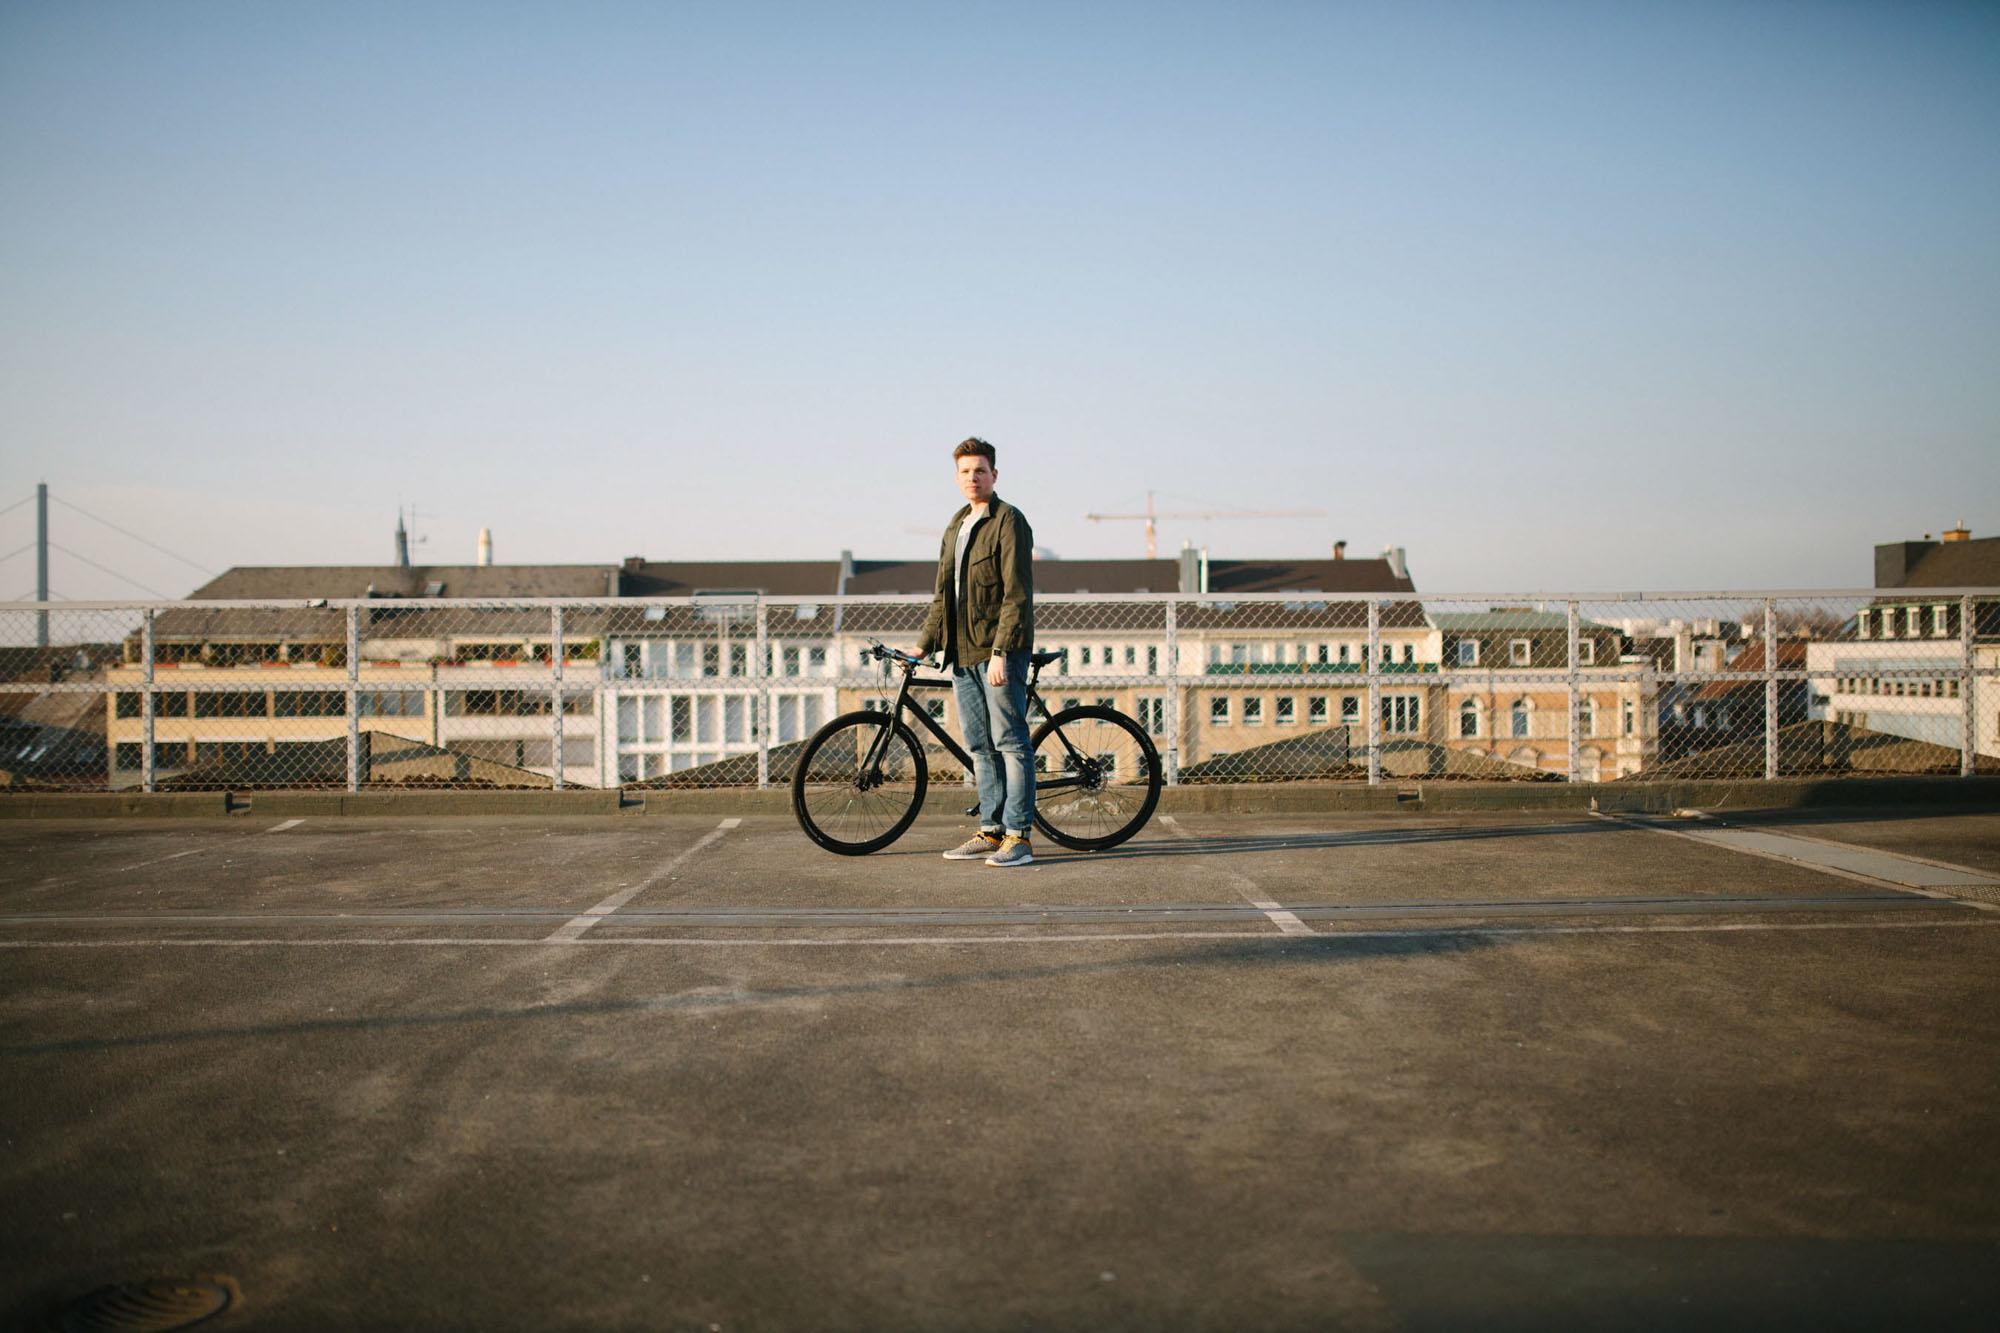 06-Ben-Erben-Jens-Quasten-Cube-Parkdeck-01